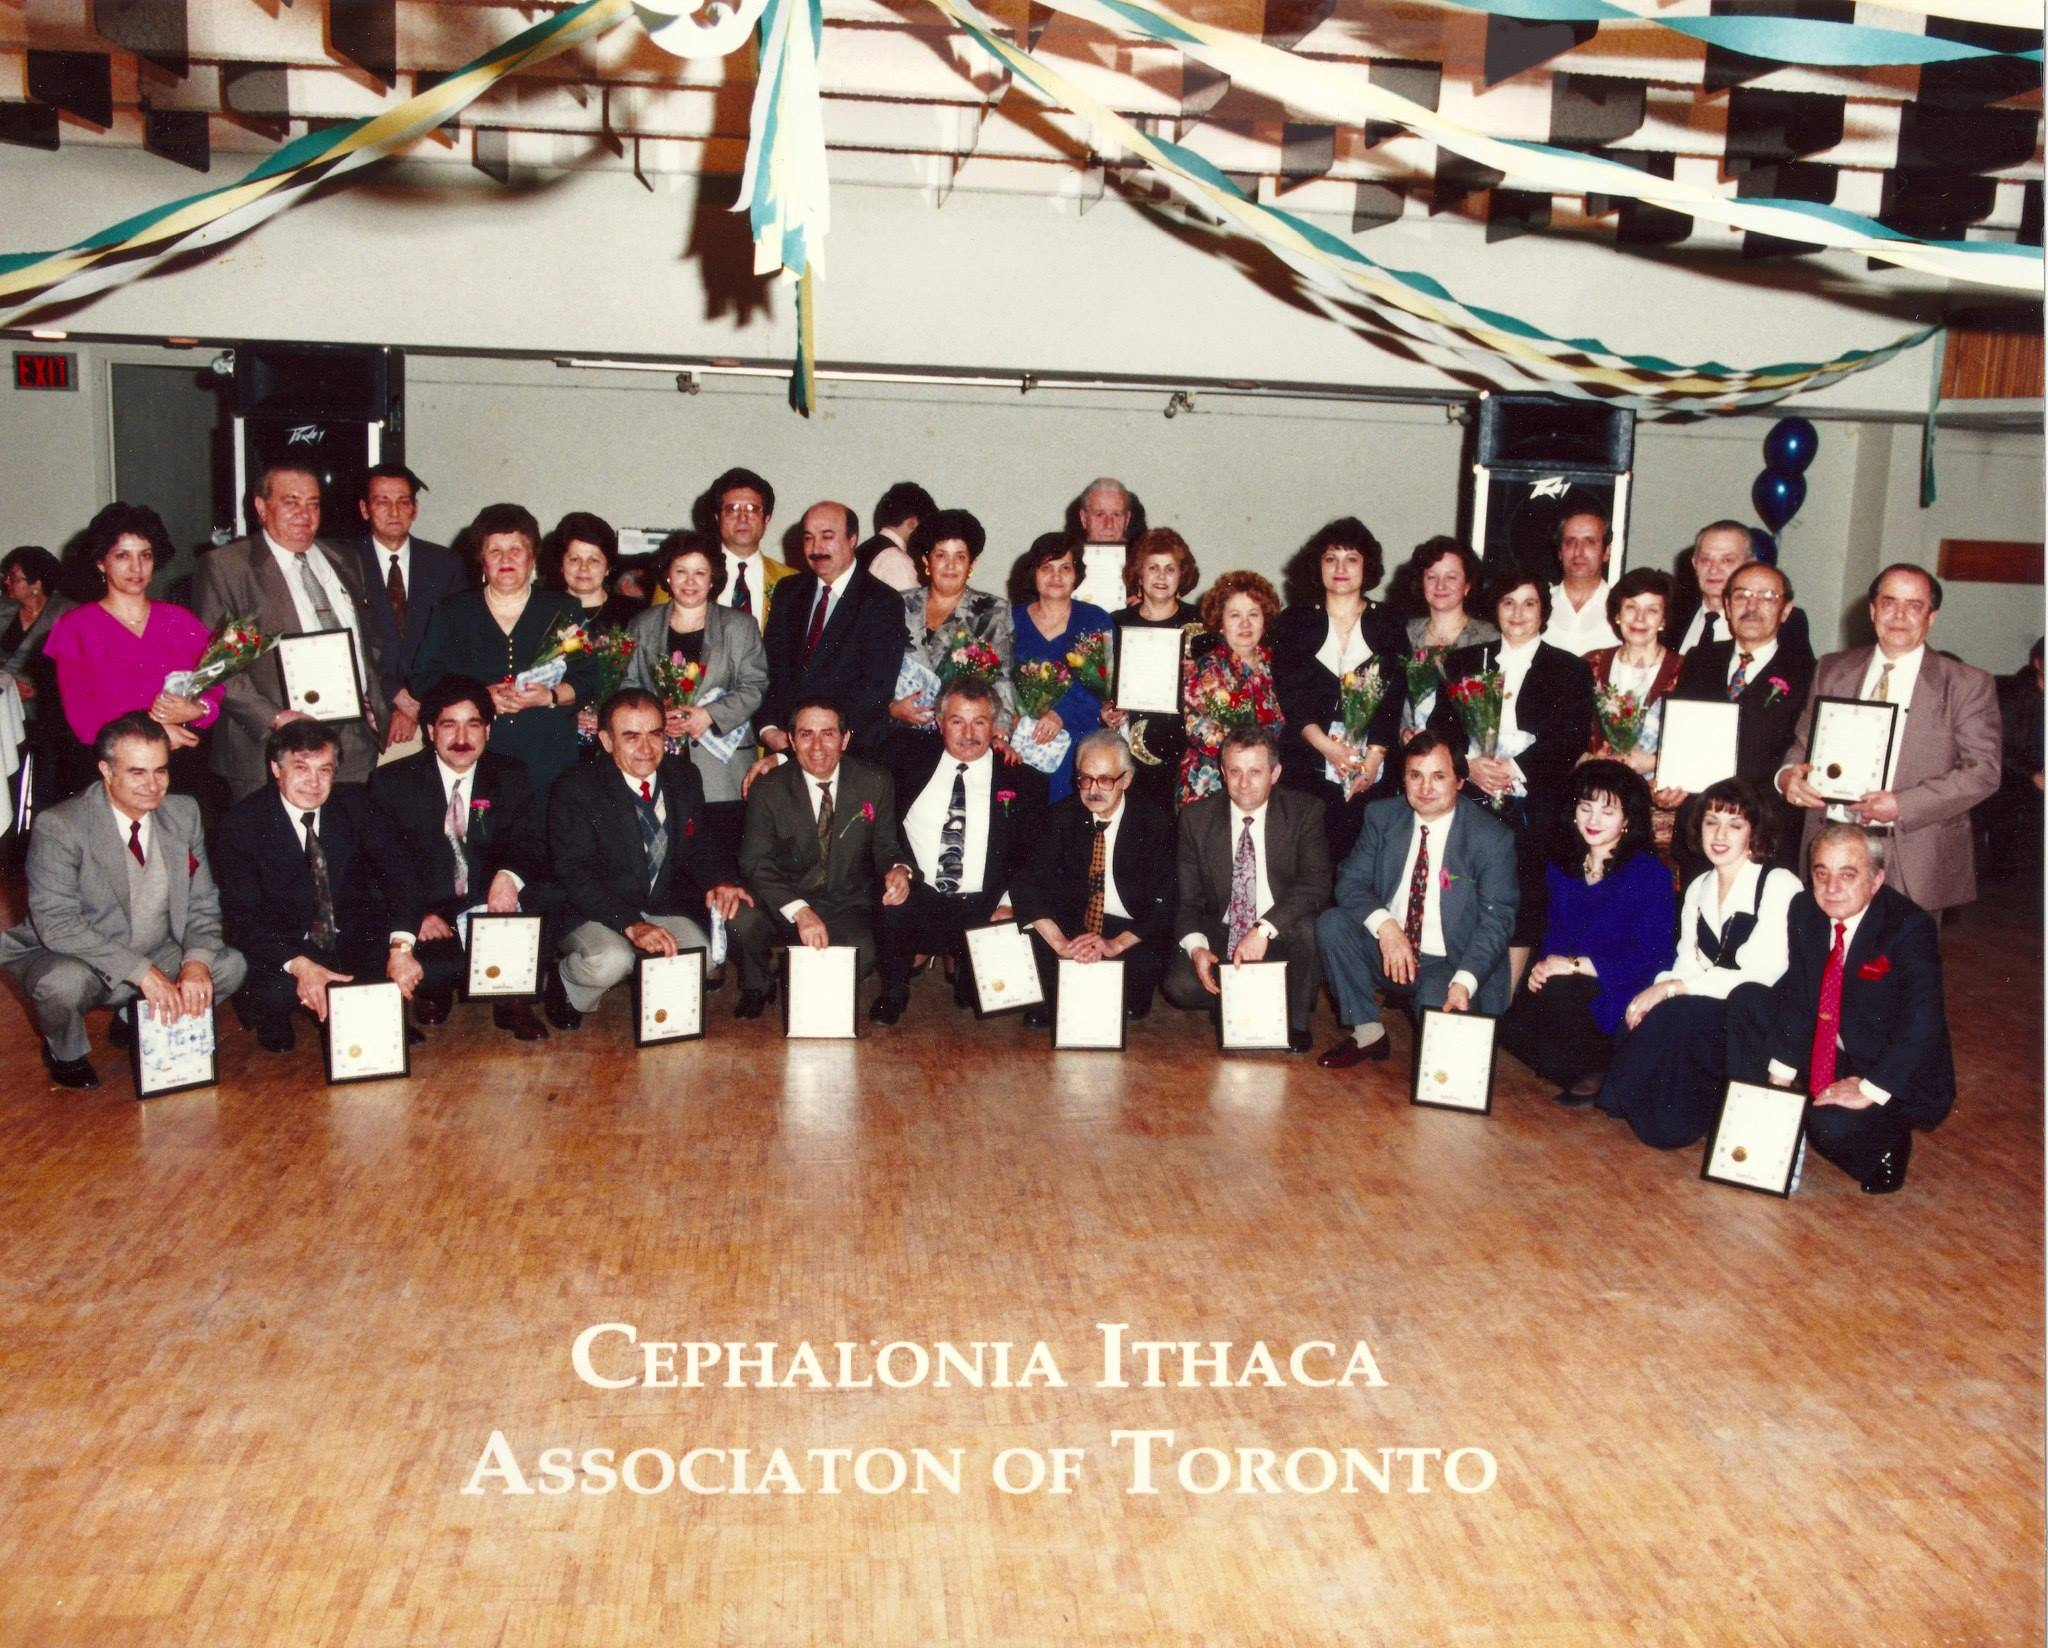 Cephalonia Association in Toronto